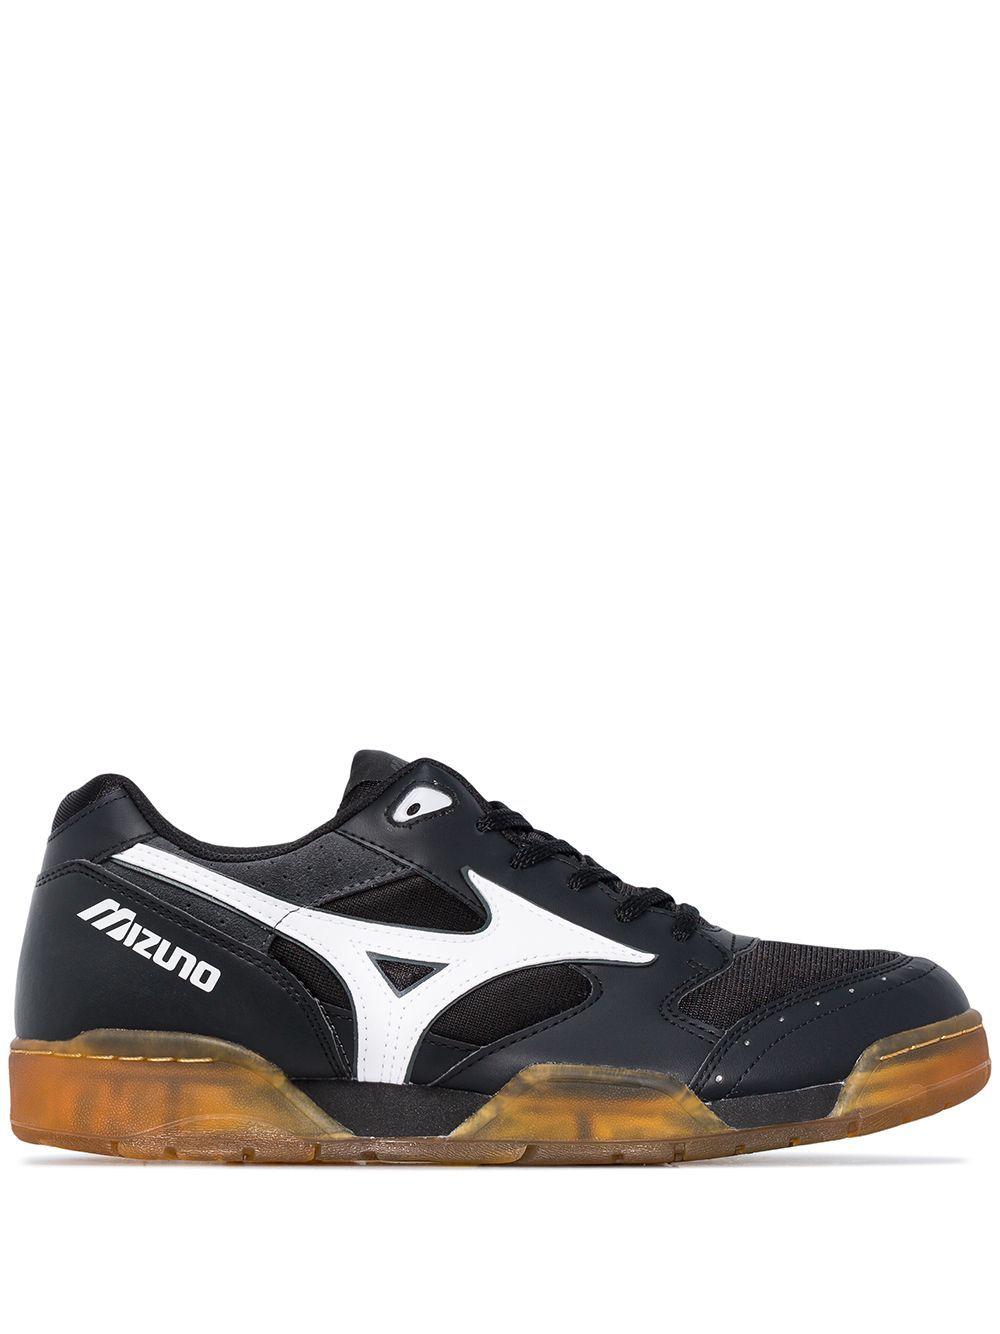 Mizuno Court Select Sneakers Farfetch In 2020 Womens Sneakers Nike Sneakers Women Sneakers Men